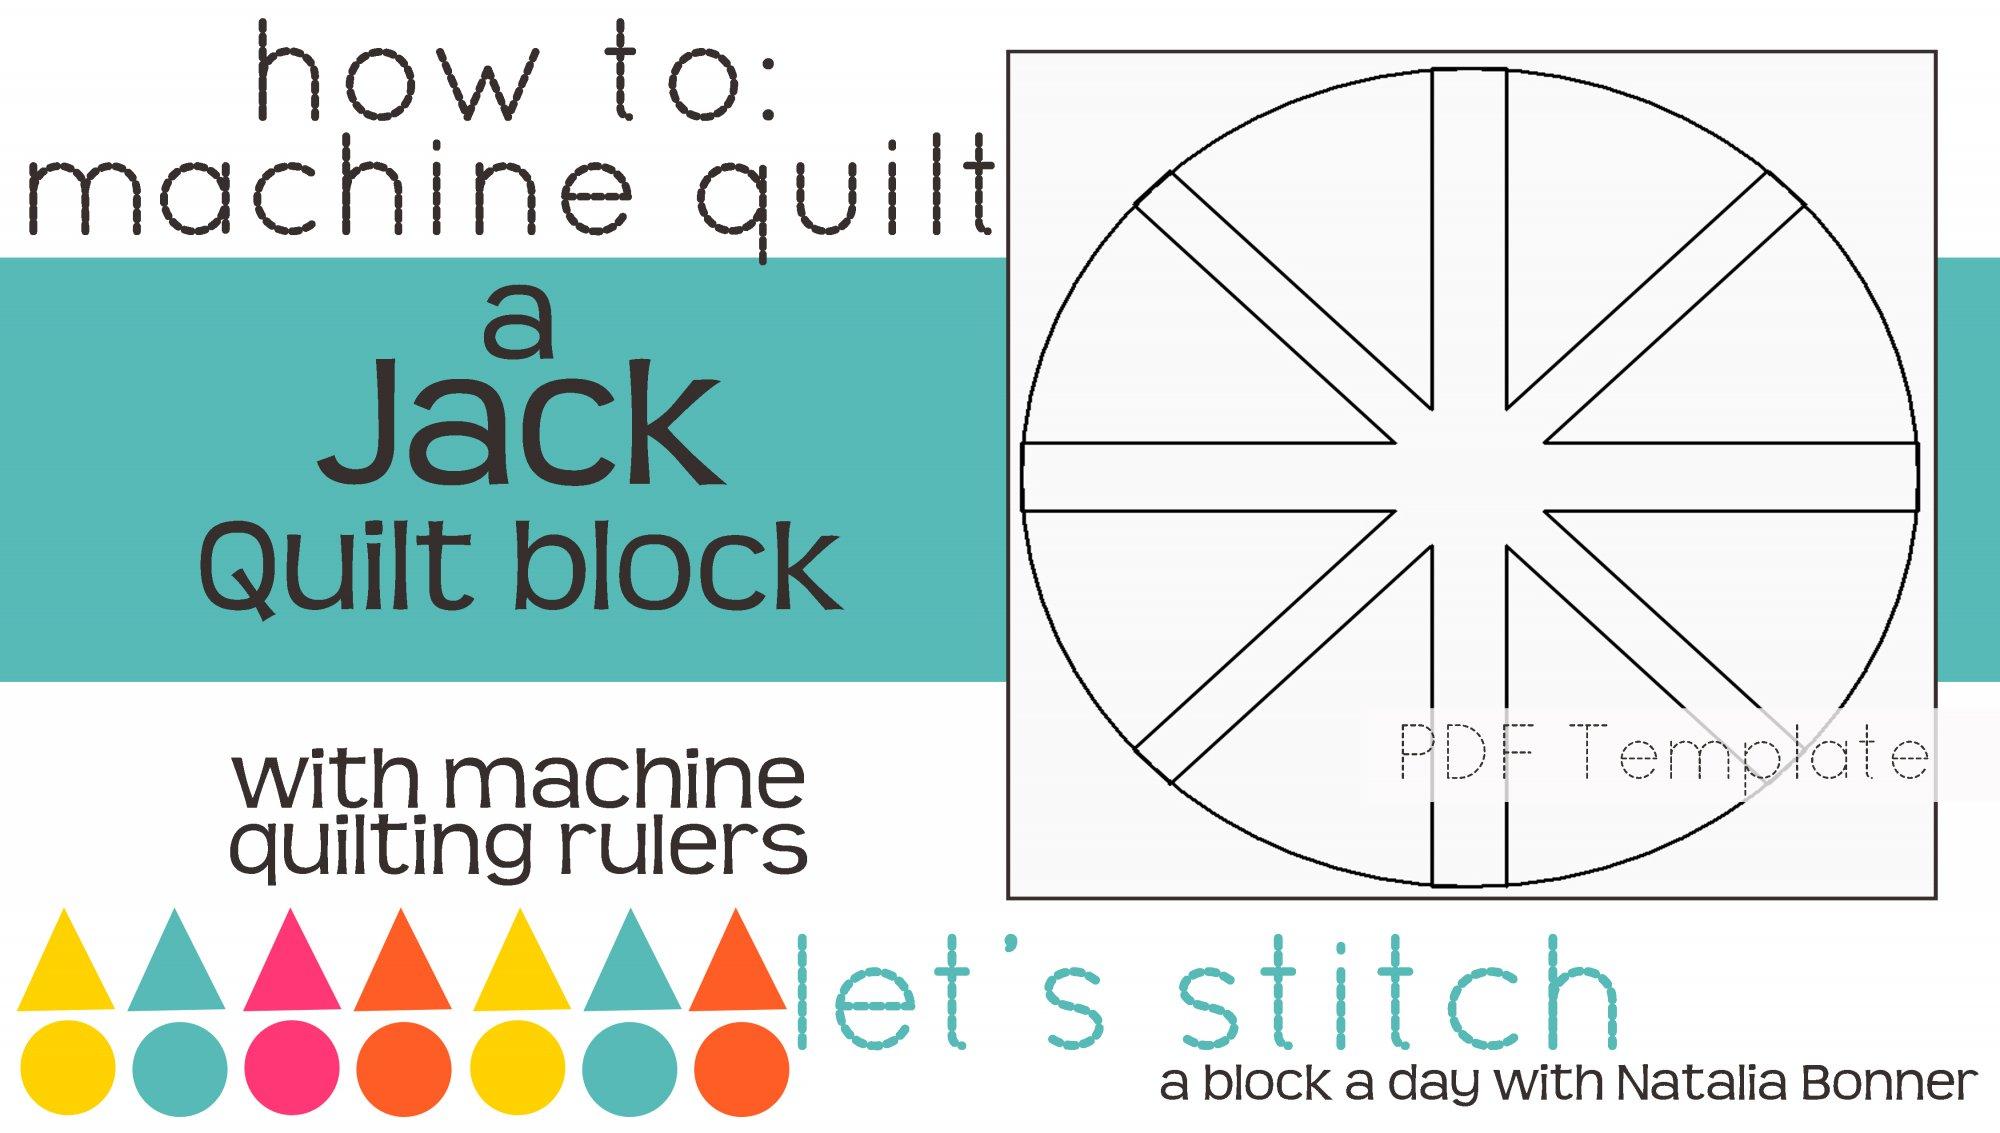 Let's Stitch - A Block a Day With Natalia Bonner - PDF - Jack